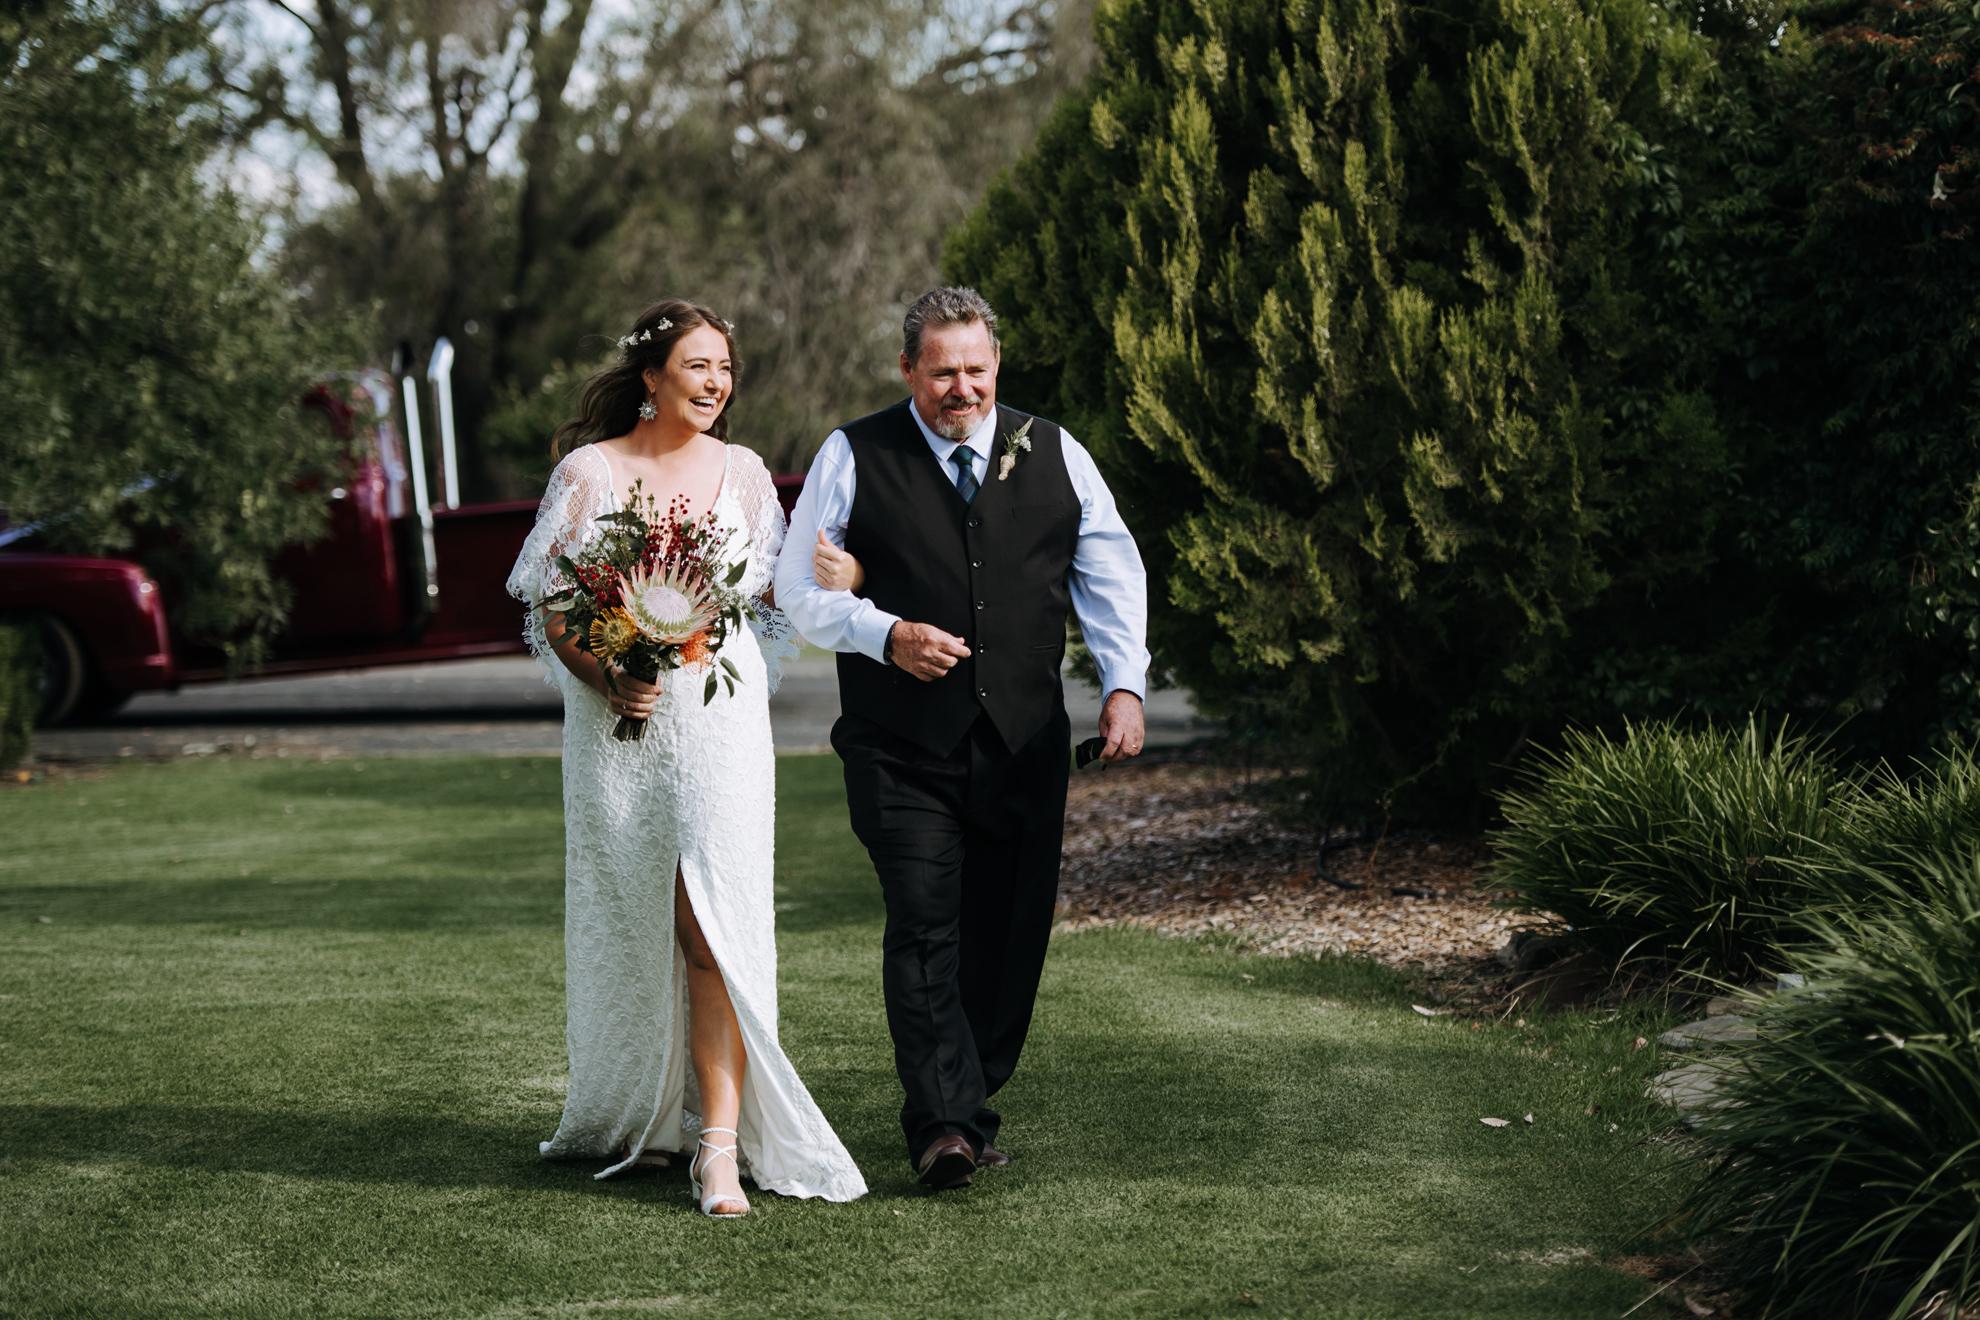 035-Jason_Jessie_Dalby_Country_Wedding.jpg